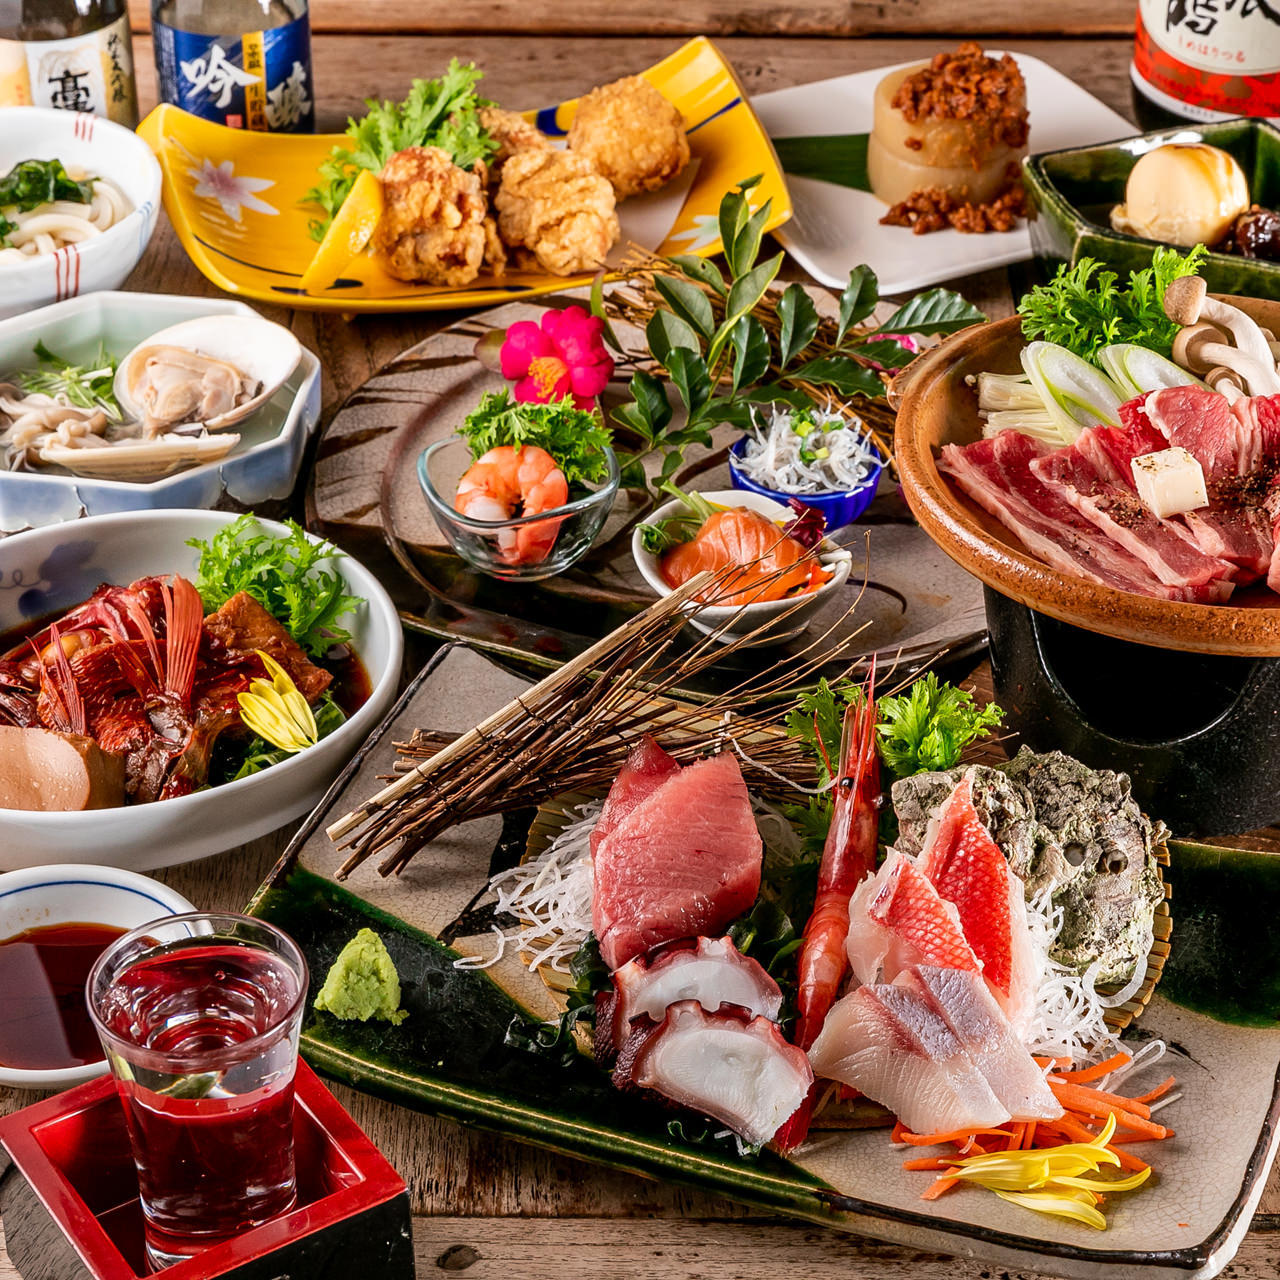 【2h飲み放題付】4月~6月限定!『金目鯛+海鮮料理+黒毛牛のコース』自慢の金目鯛と旬の鮮魚※個別盛り